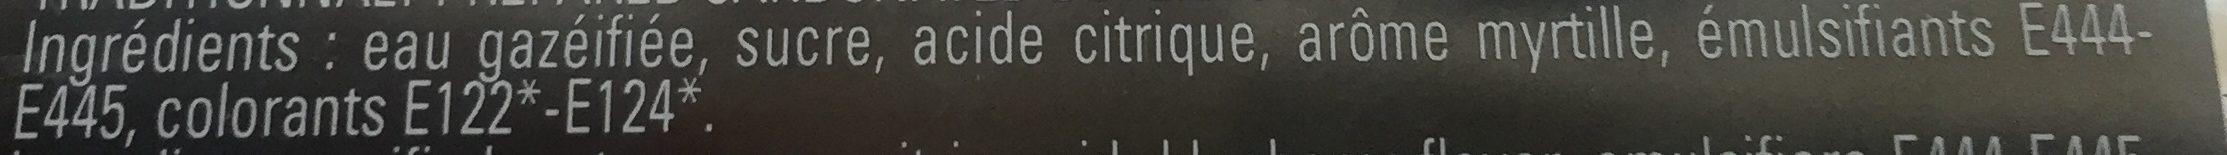 Limonade Myrtille Sauvage 75CL - Ingredients - fr